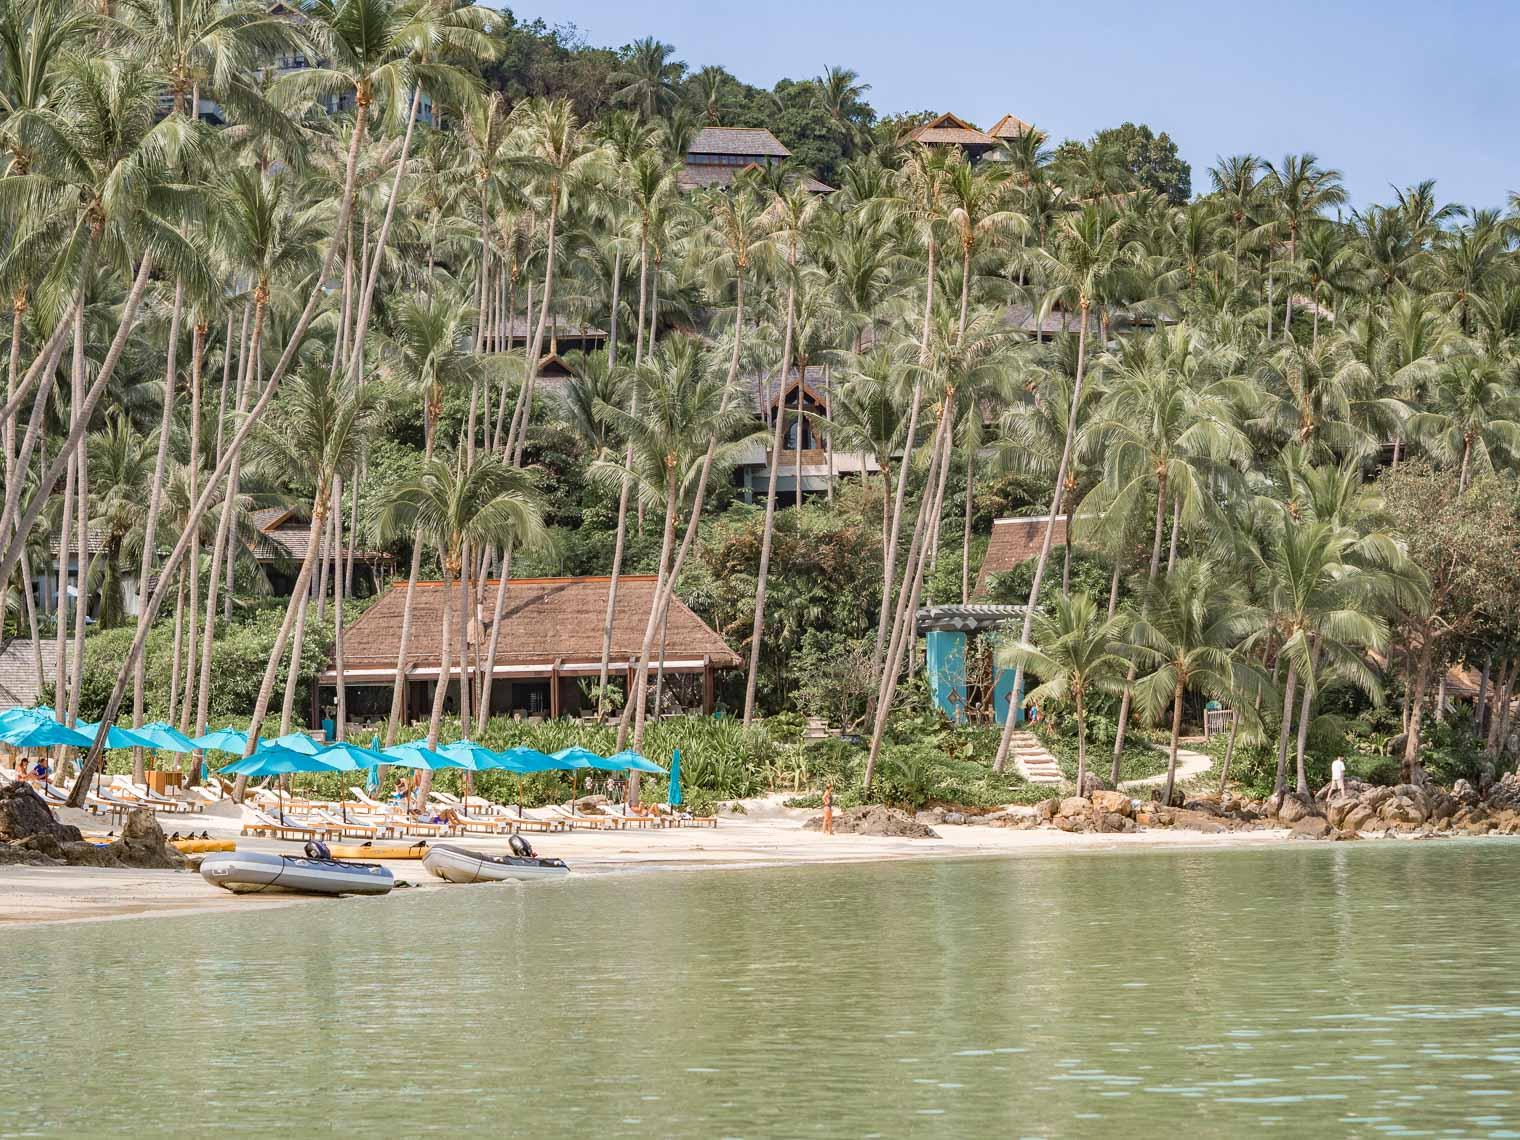 Private beach at Four Seasons hotel Koh Samui Thailand